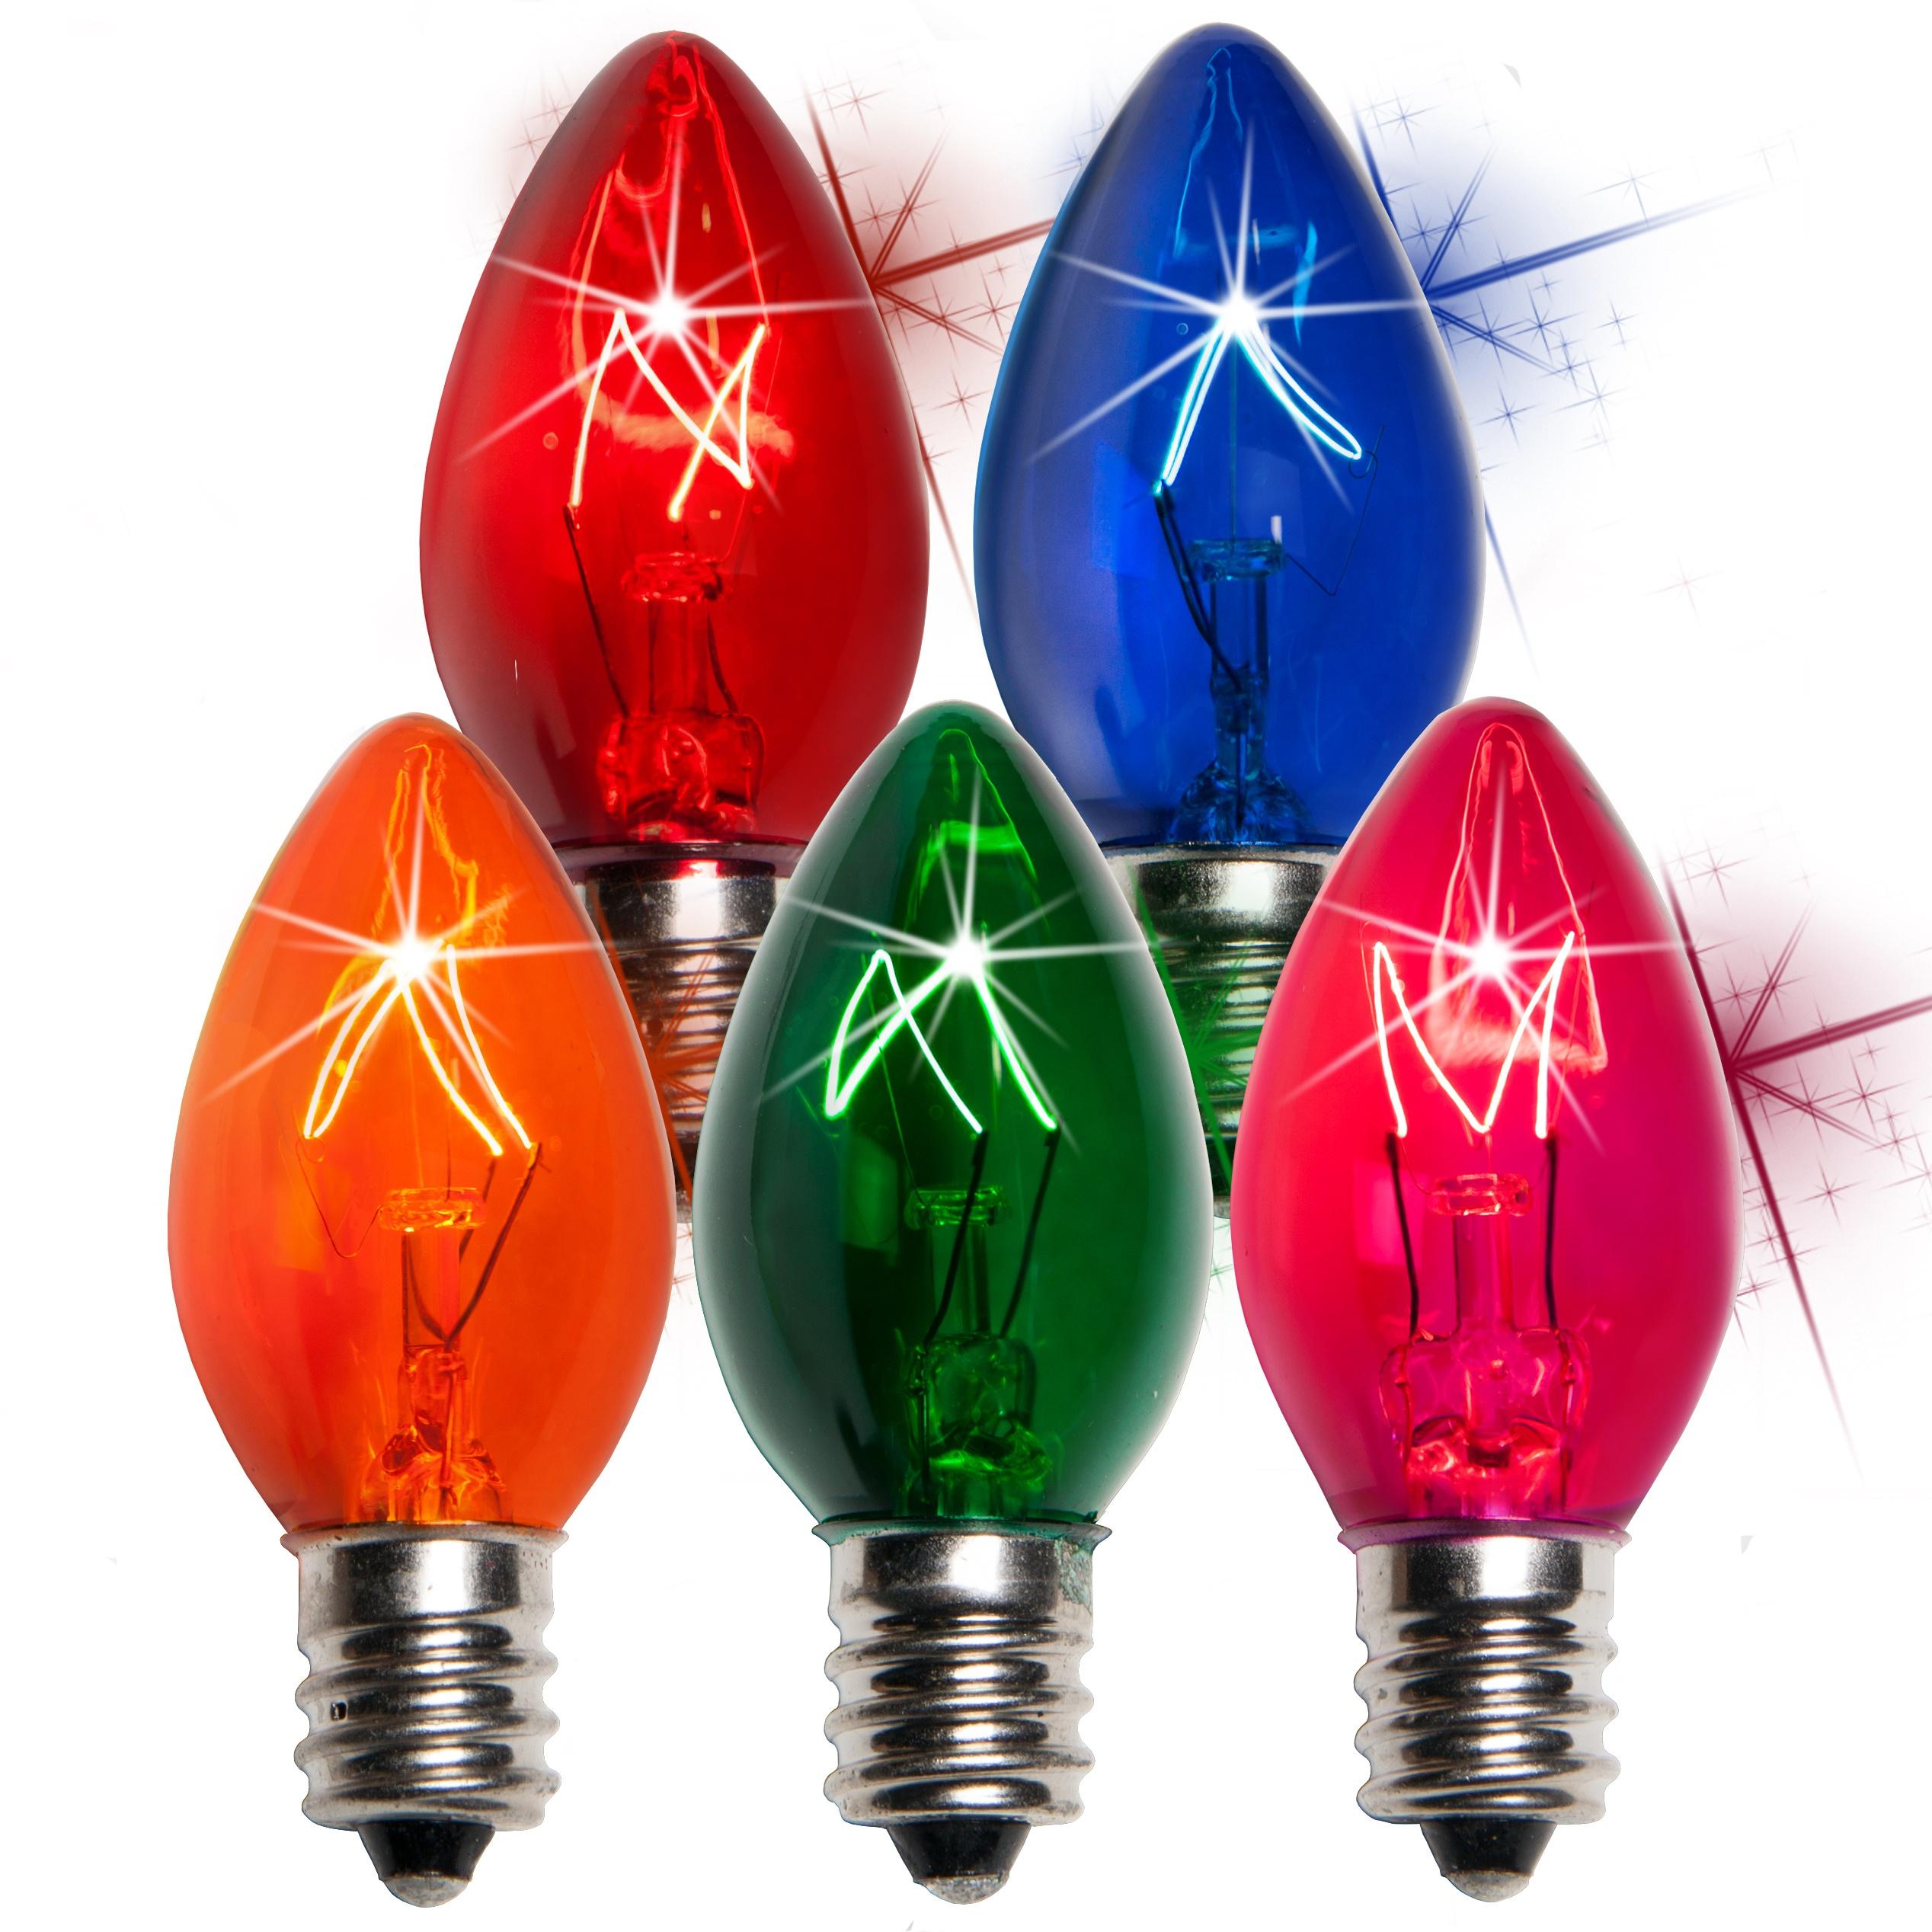 Replacement Outdoor Christmas Light Bulbs